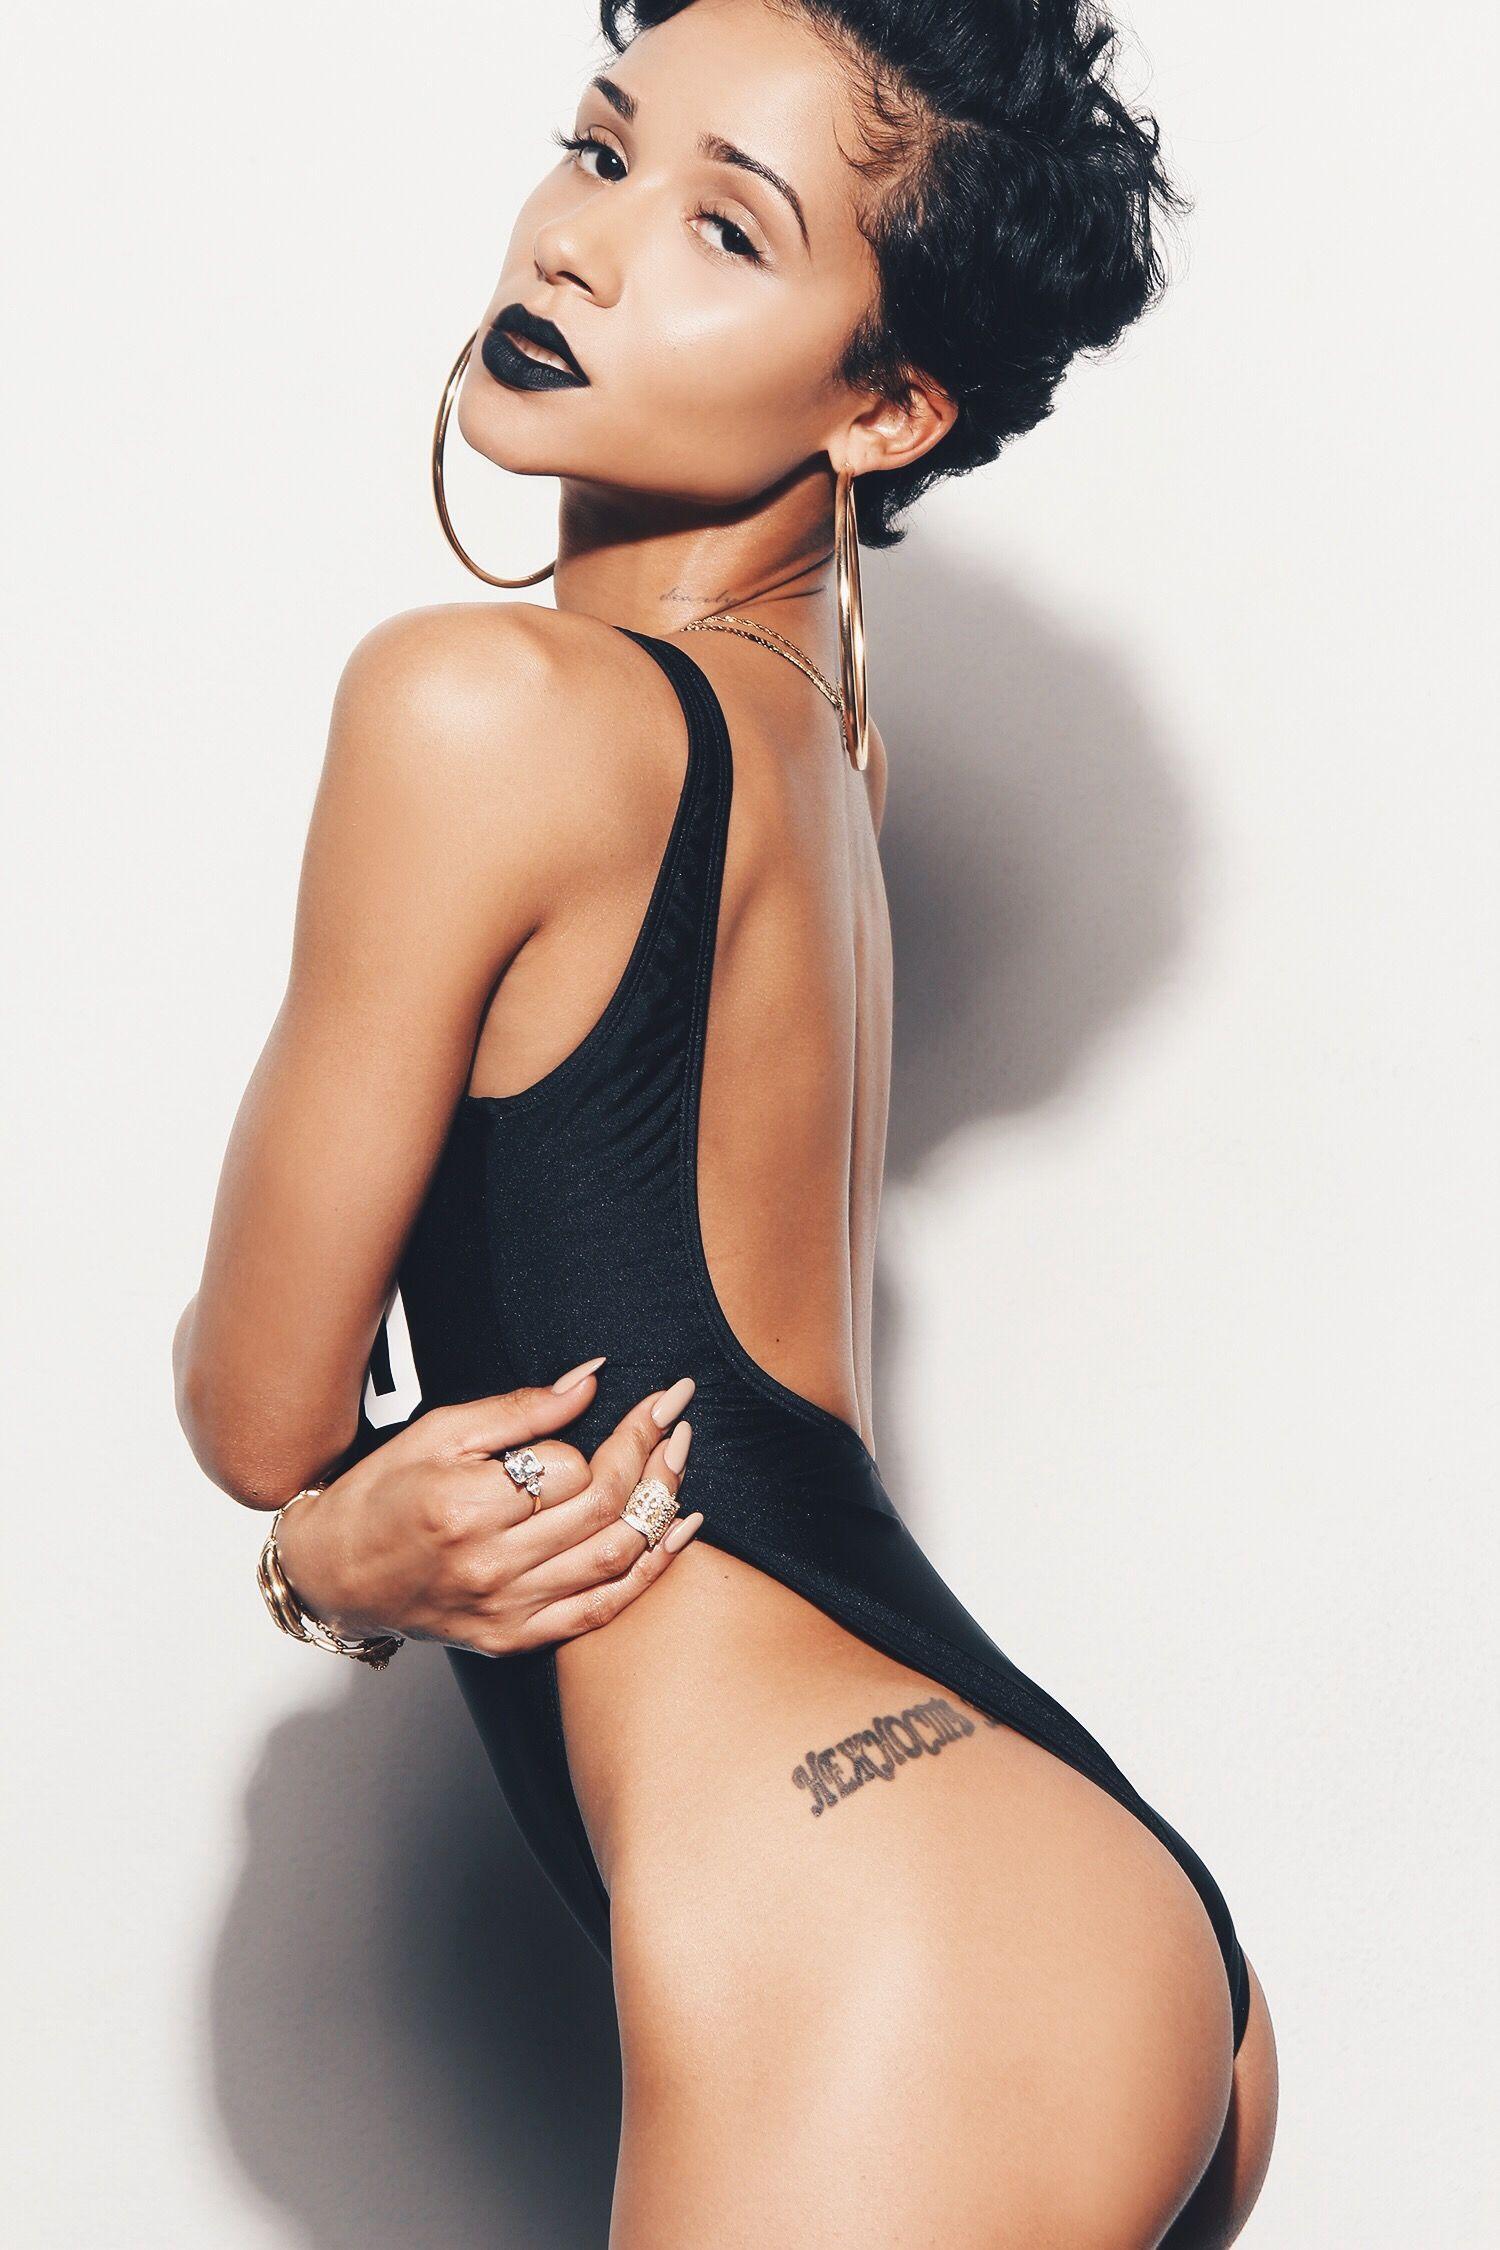 Celebrity Tanaya Henry naked (32 photos), Pussy, Is a cute, Boobs, bra 2017